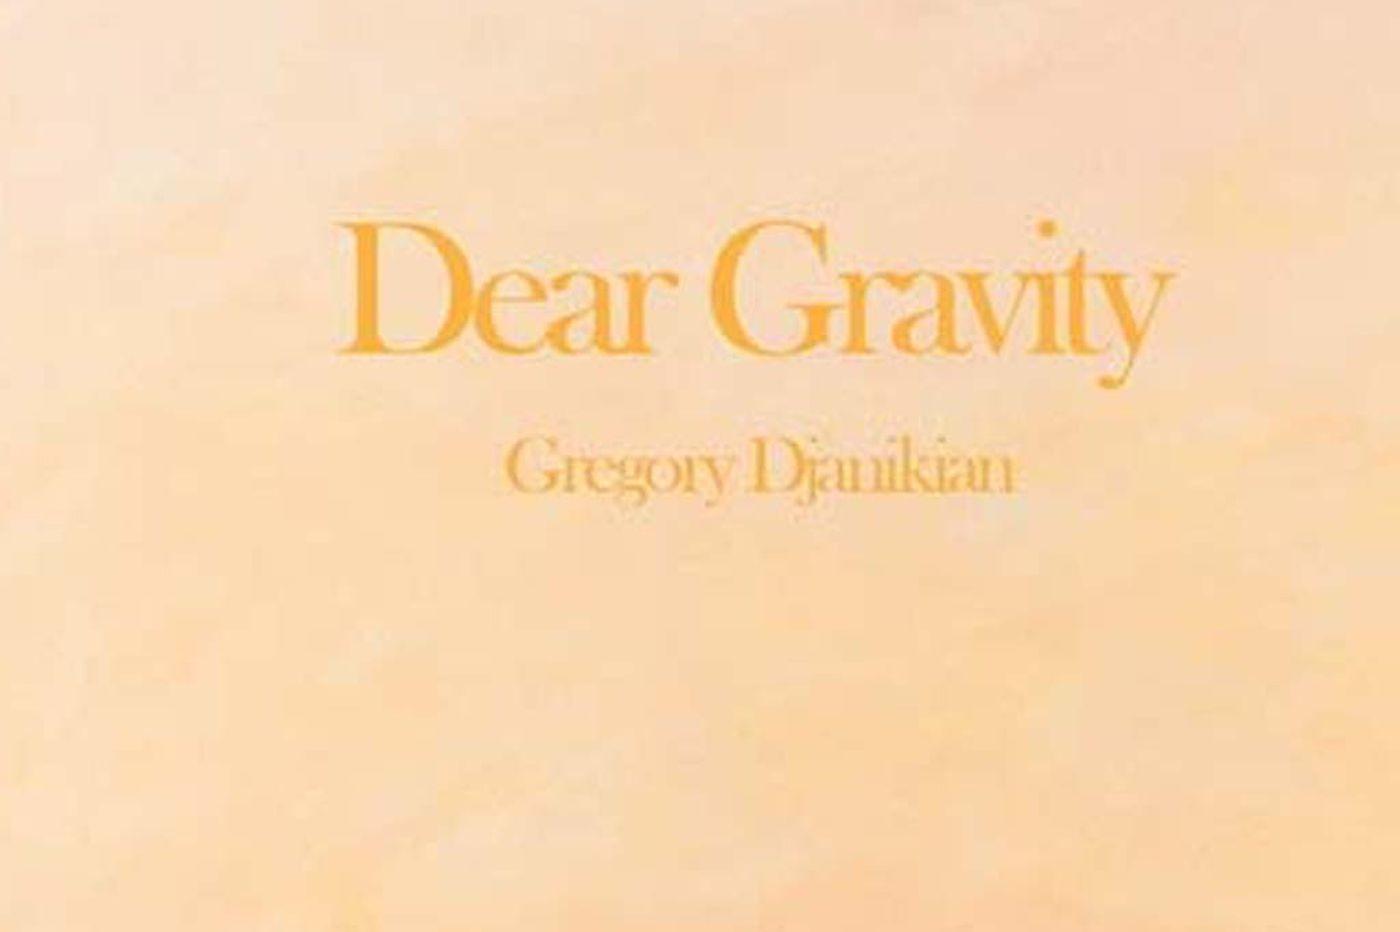 Djanikian's Gravity has true pulling power